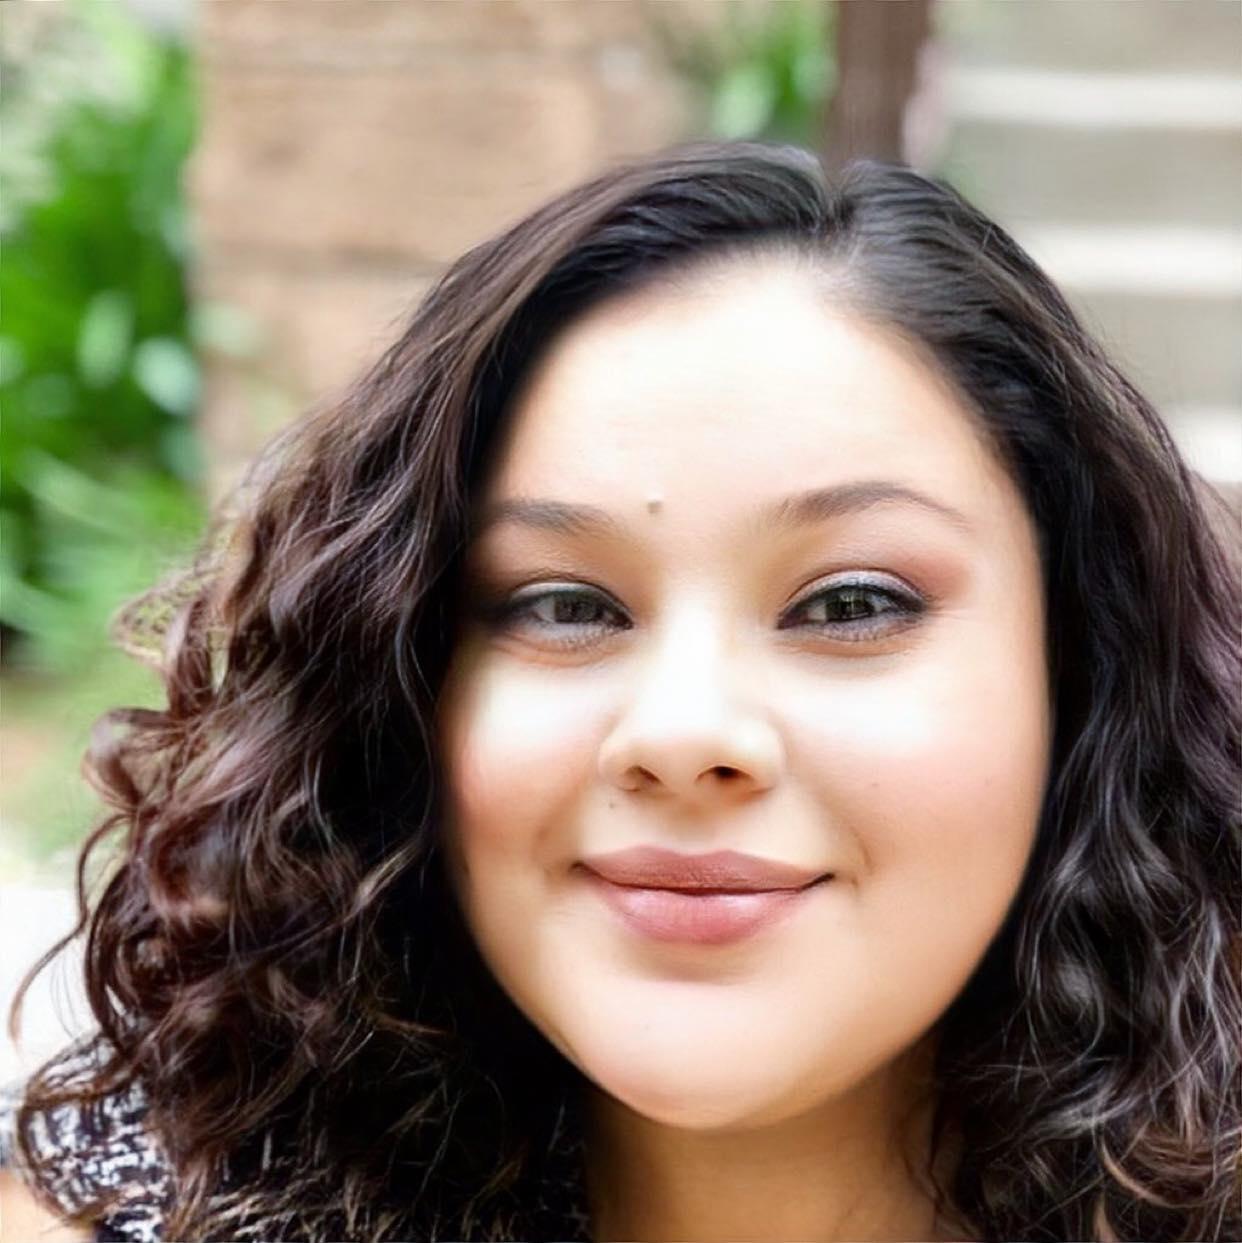 Brenda Estrada